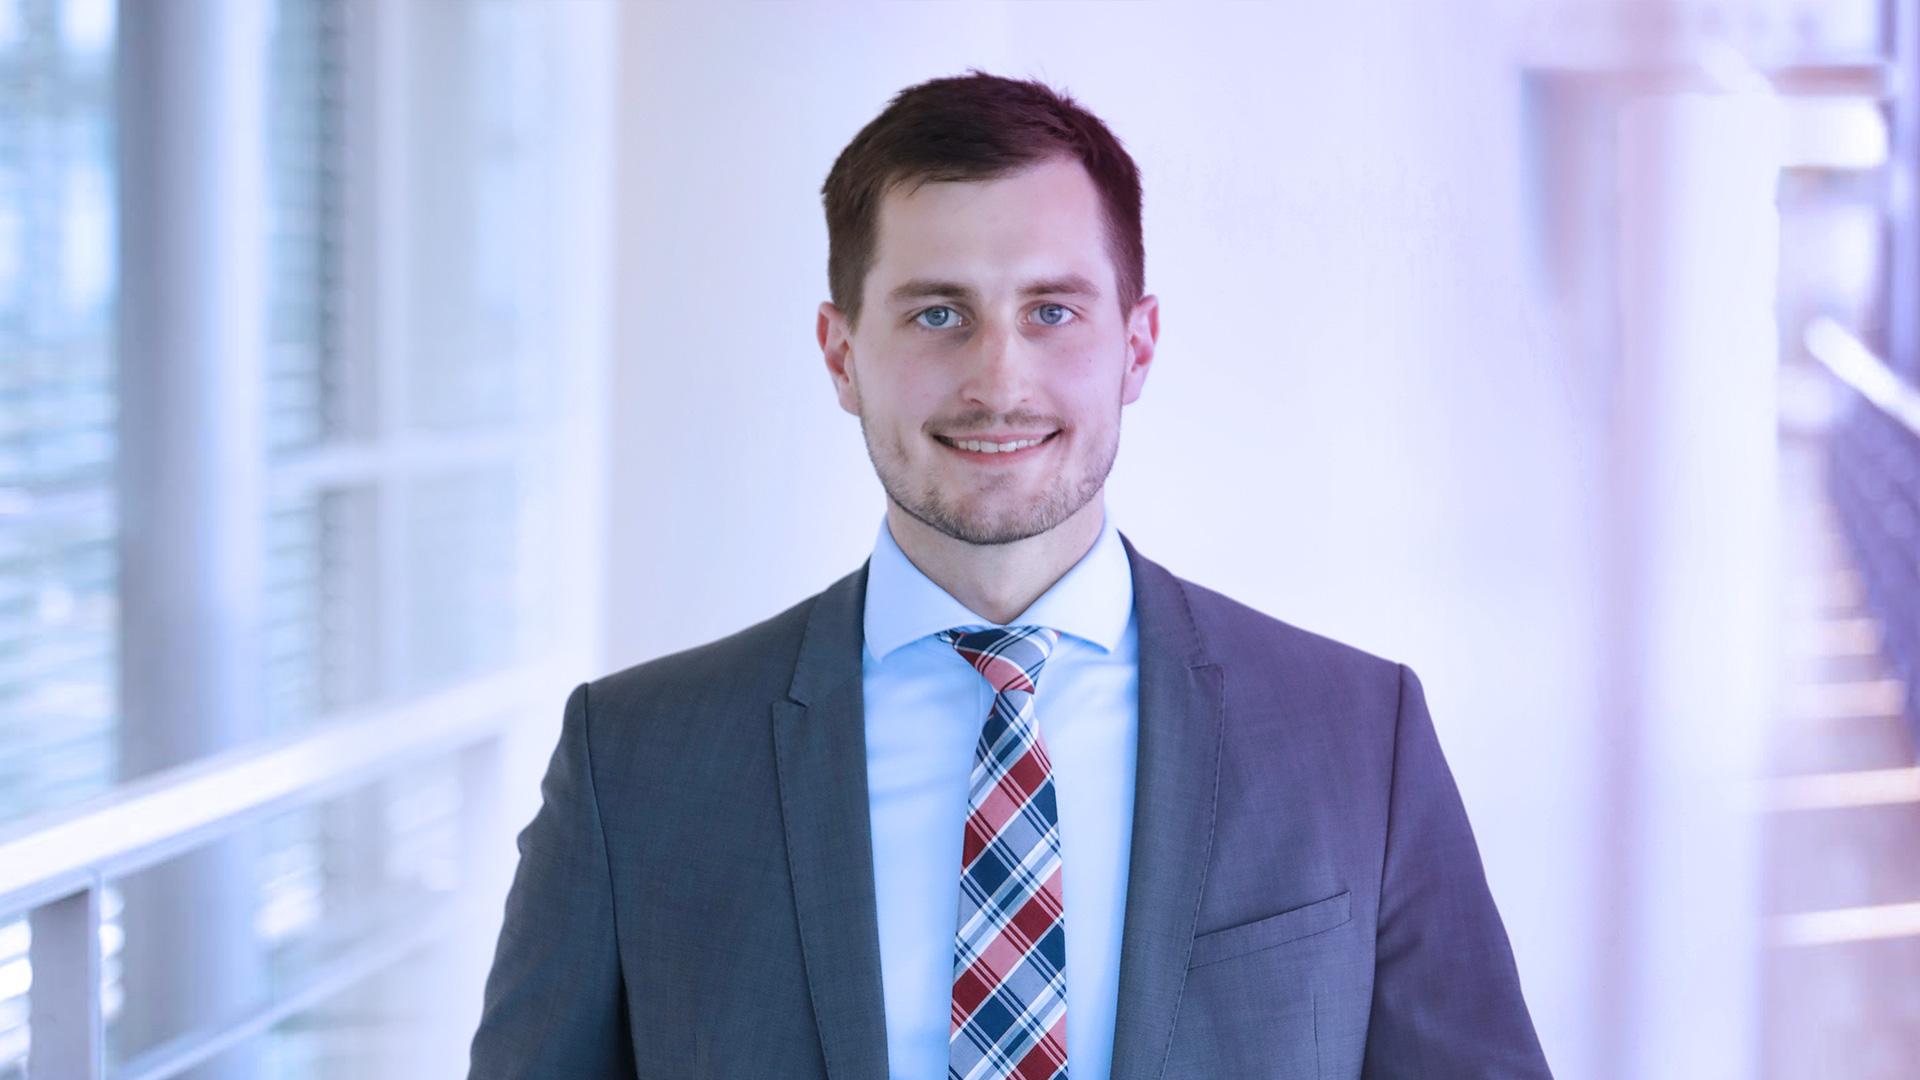 Martin Gieca Consultant